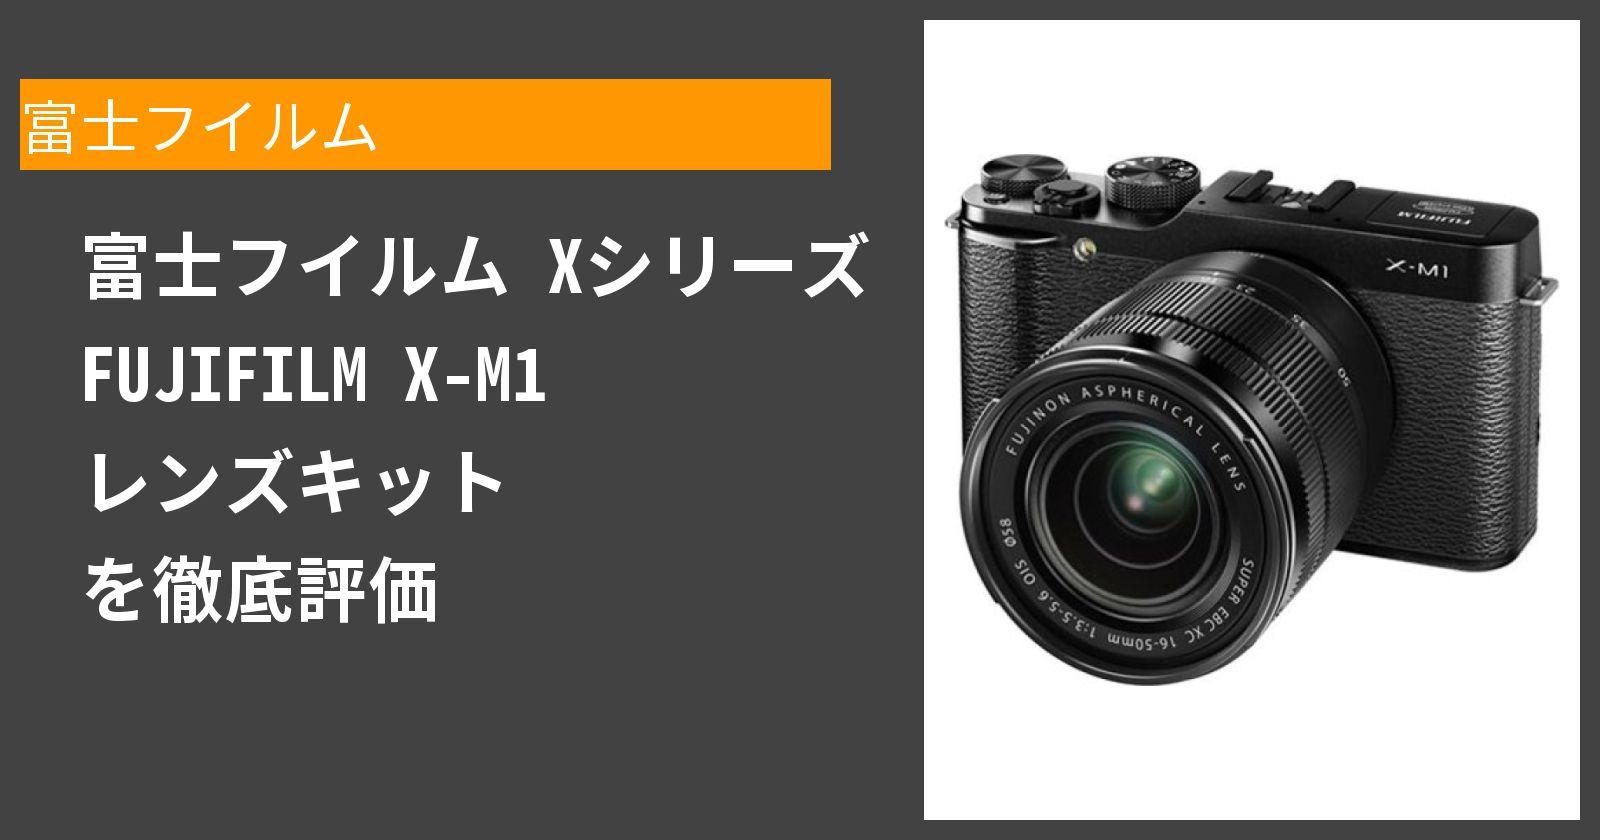 FUJIFILM X-M1 レンズキットを徹底評価